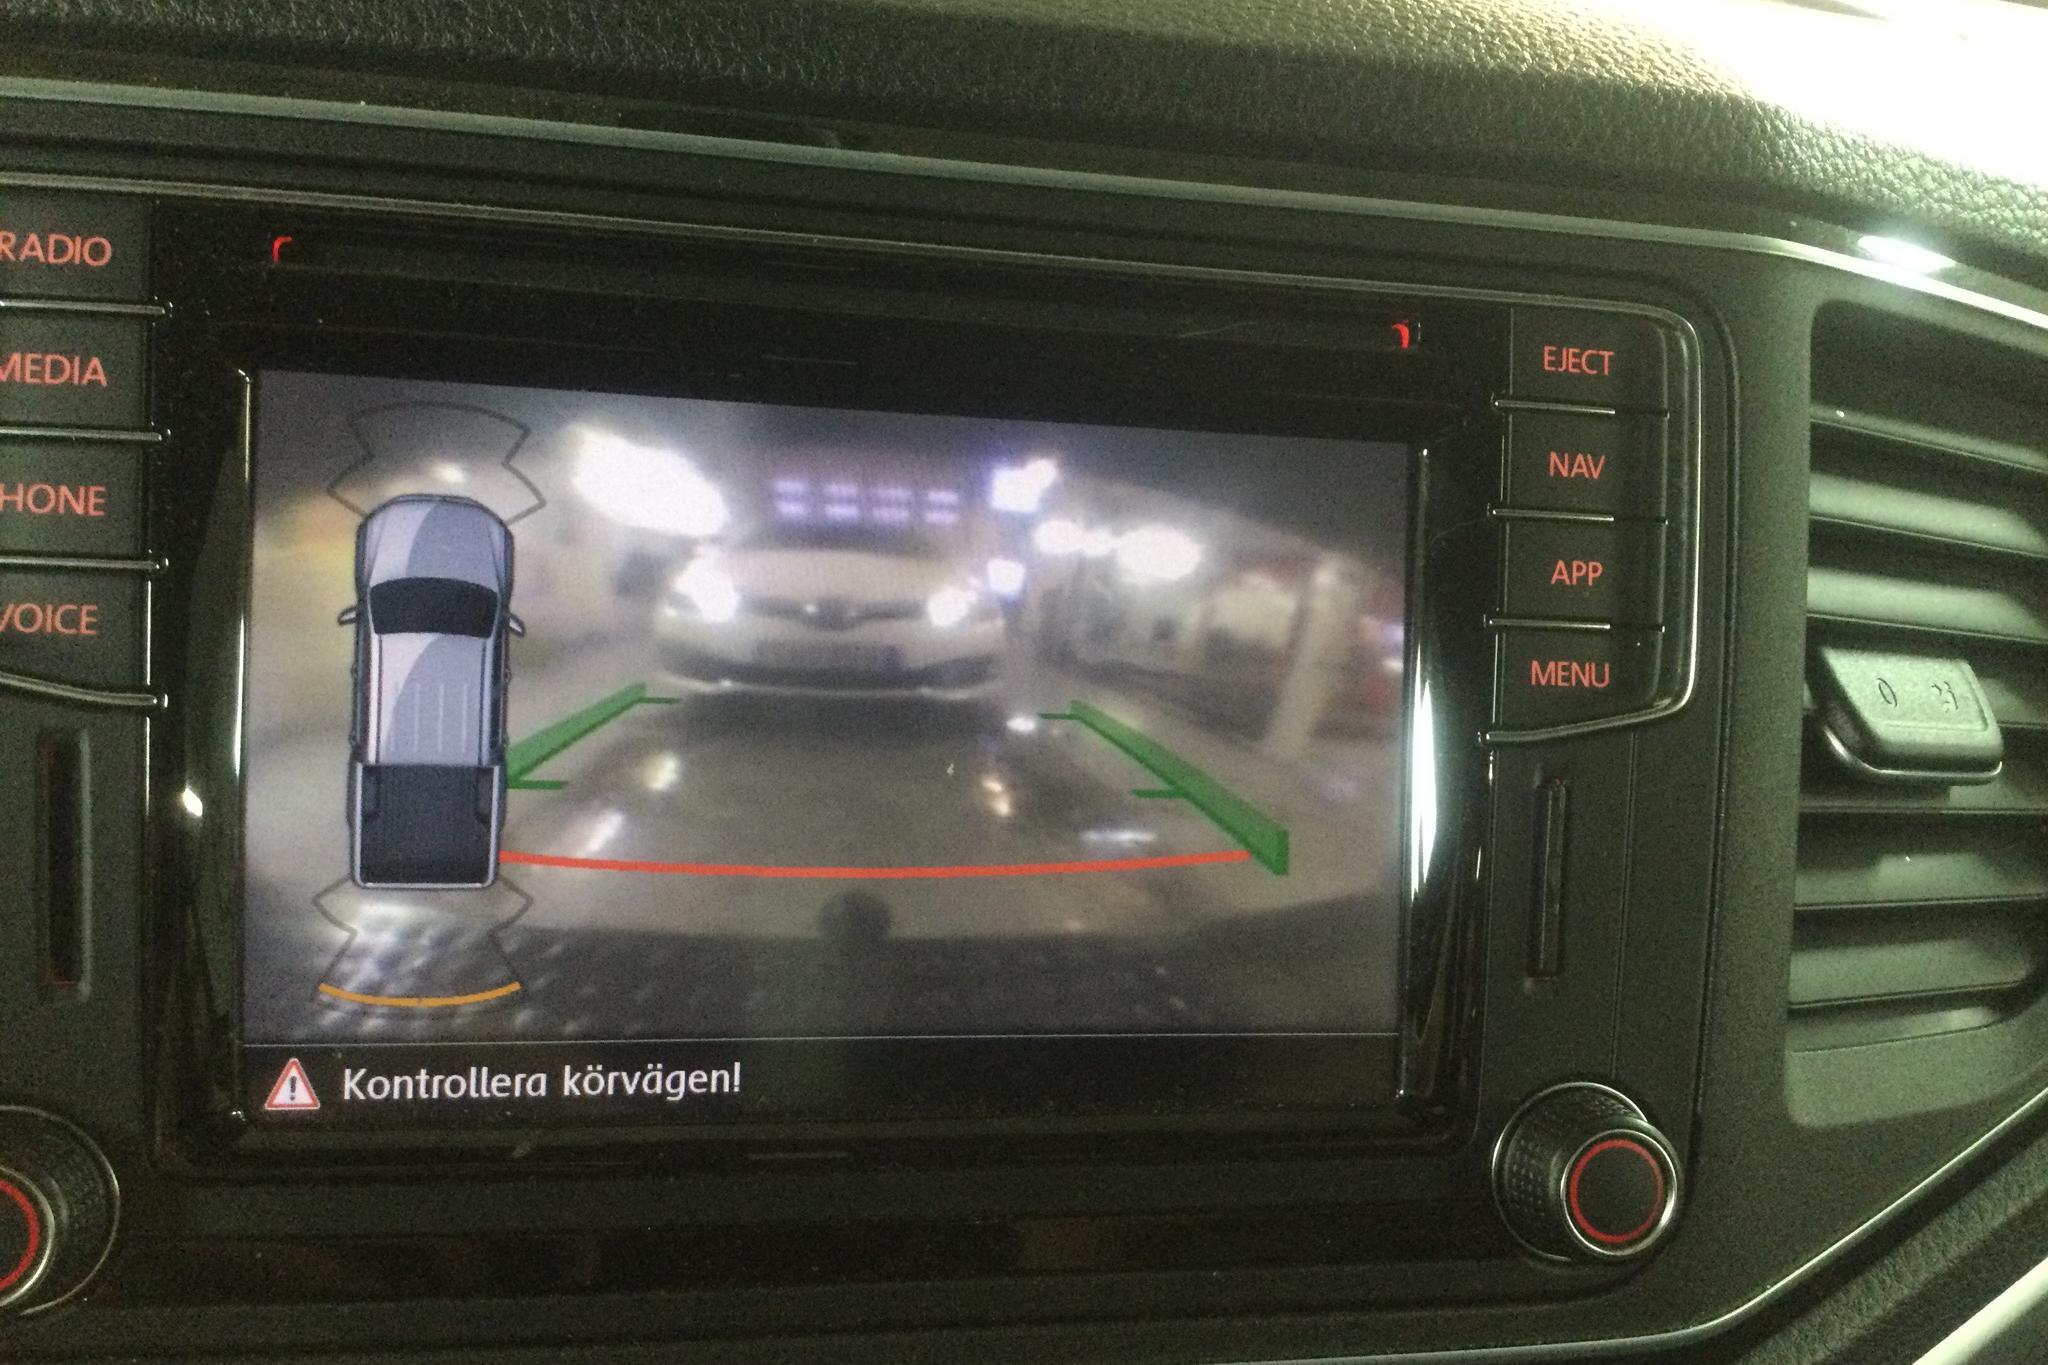 VW Amarok 3.0 TDI 4motion (224hk) - 11 926 mil - Automat - brun - 2018